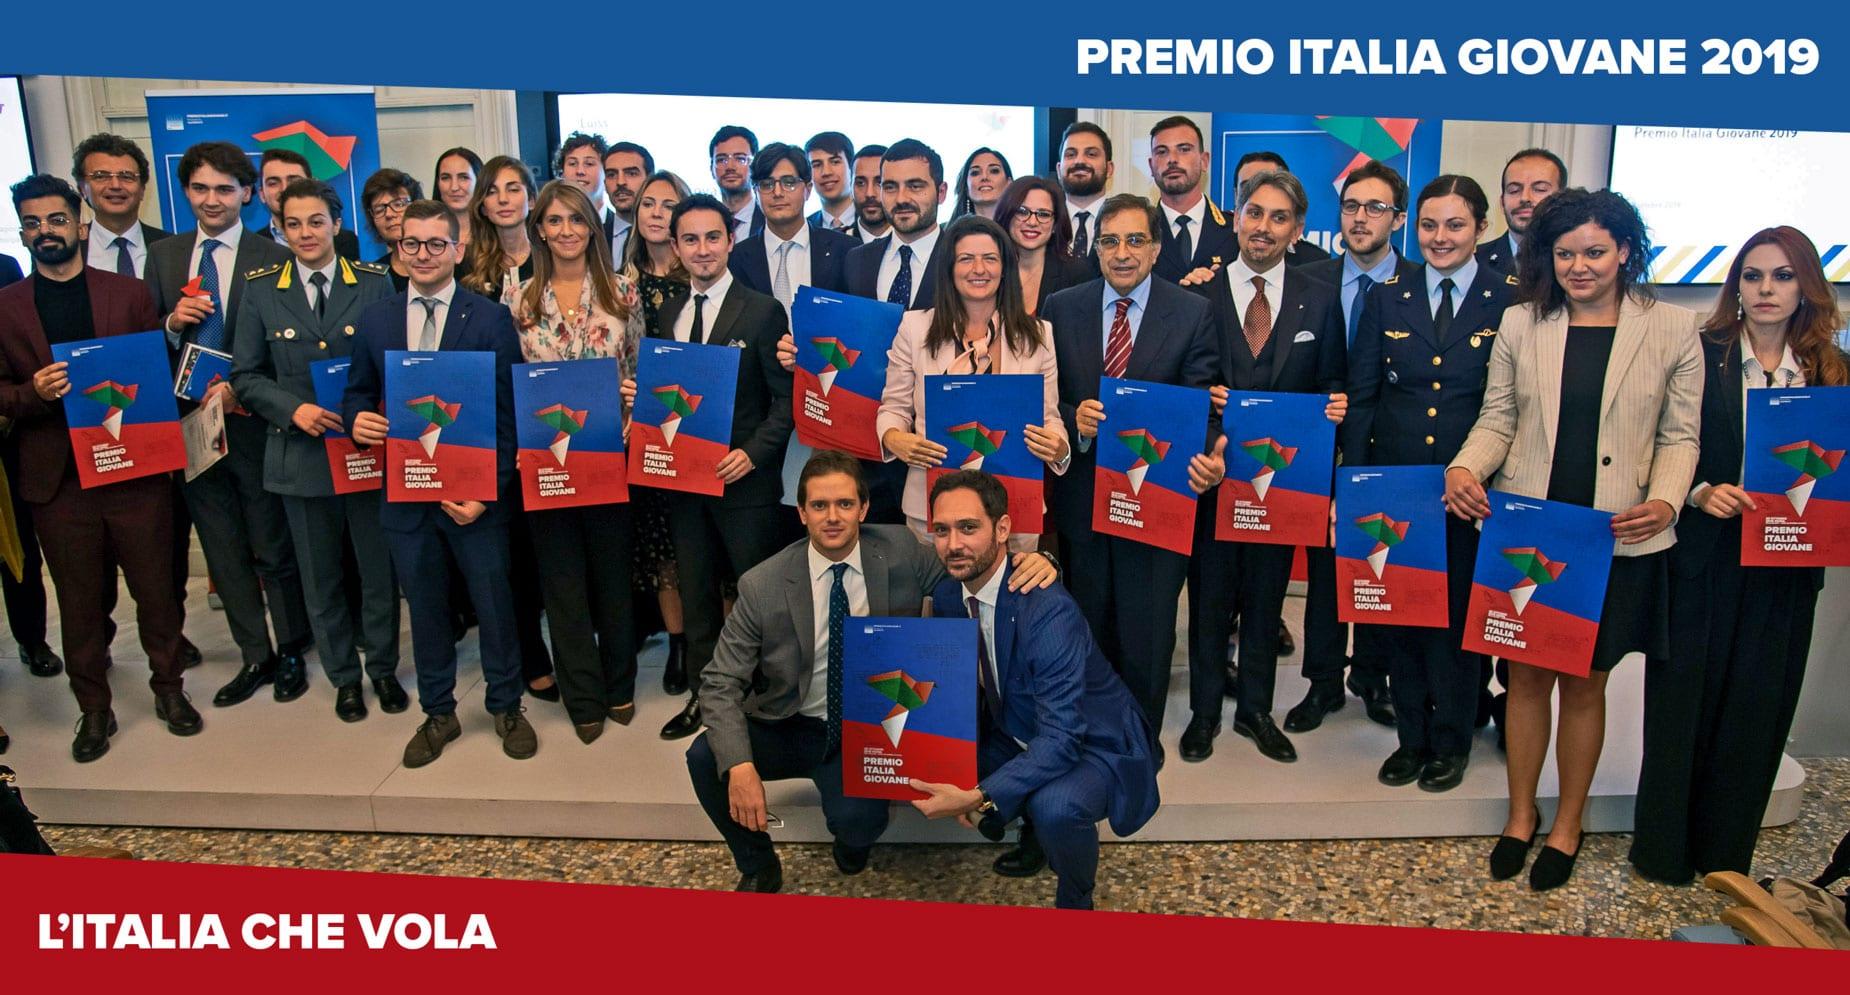 Gruppo Premio Italia Giovane 2019